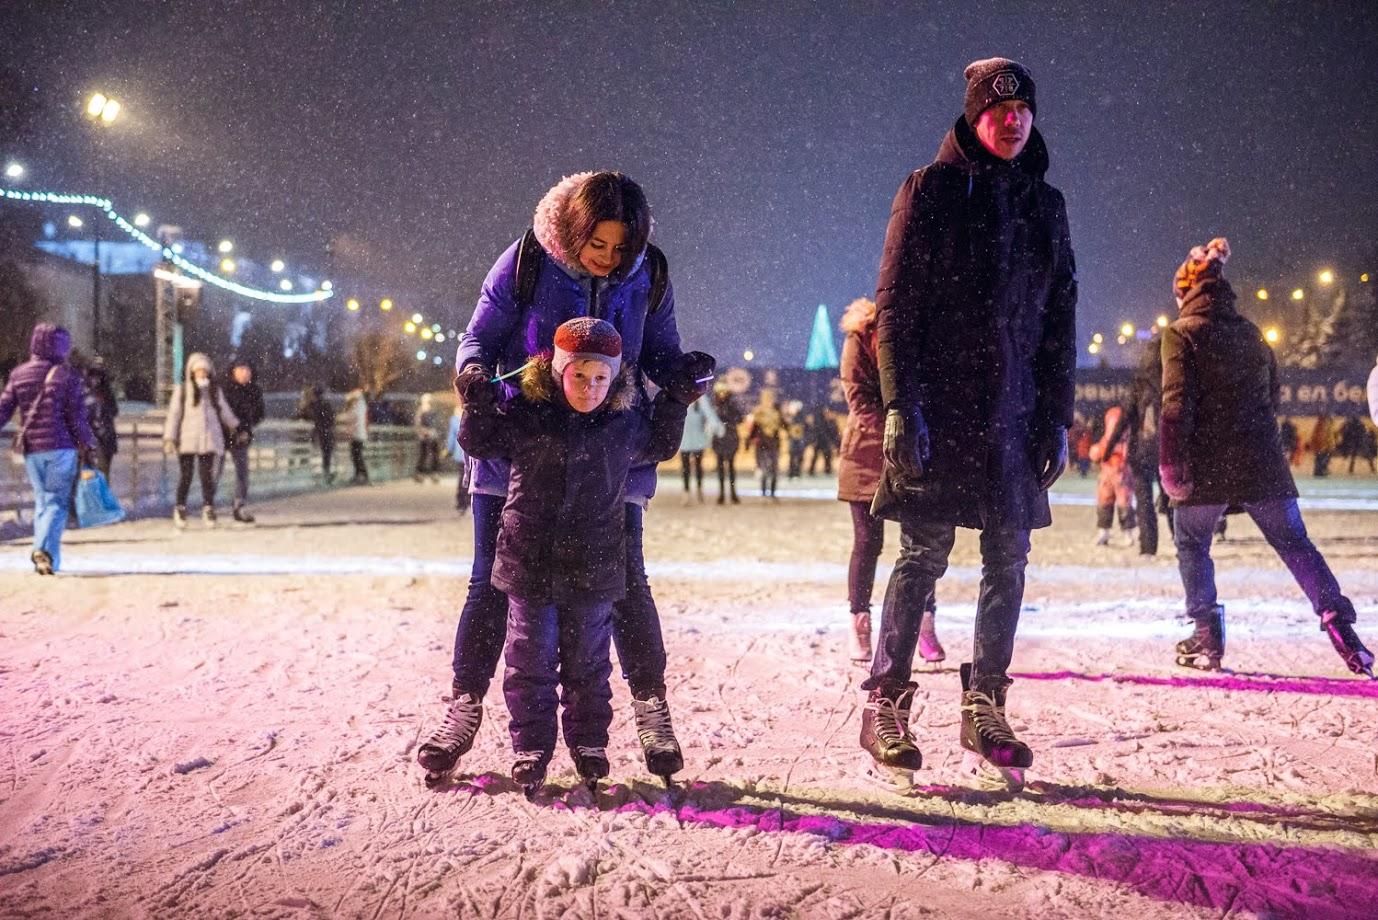 Фото: Владимир Васильев, материалы пресс-служб.